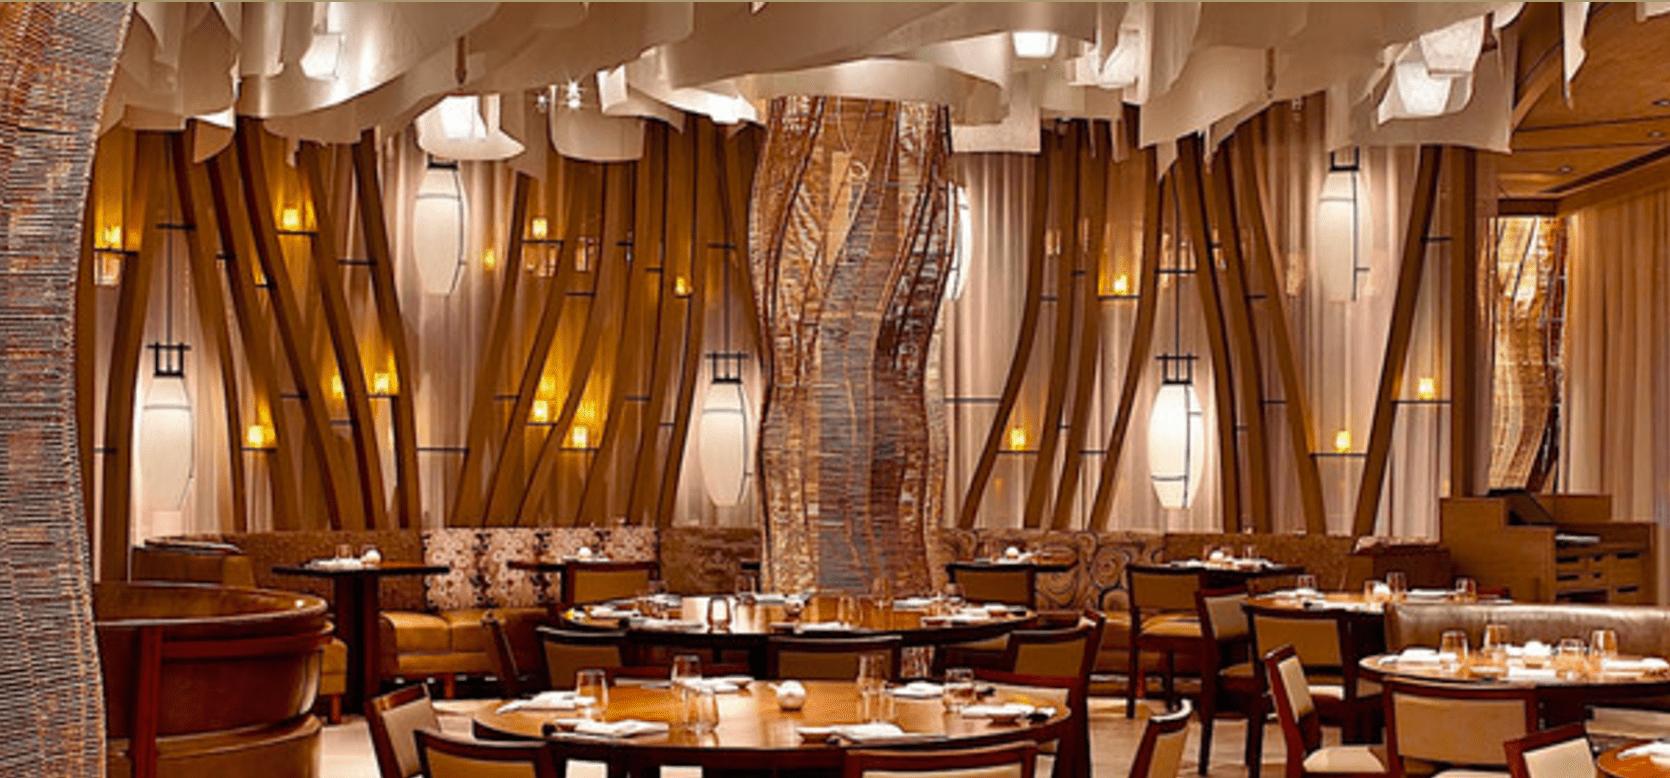 Nobu restaurant in Miami